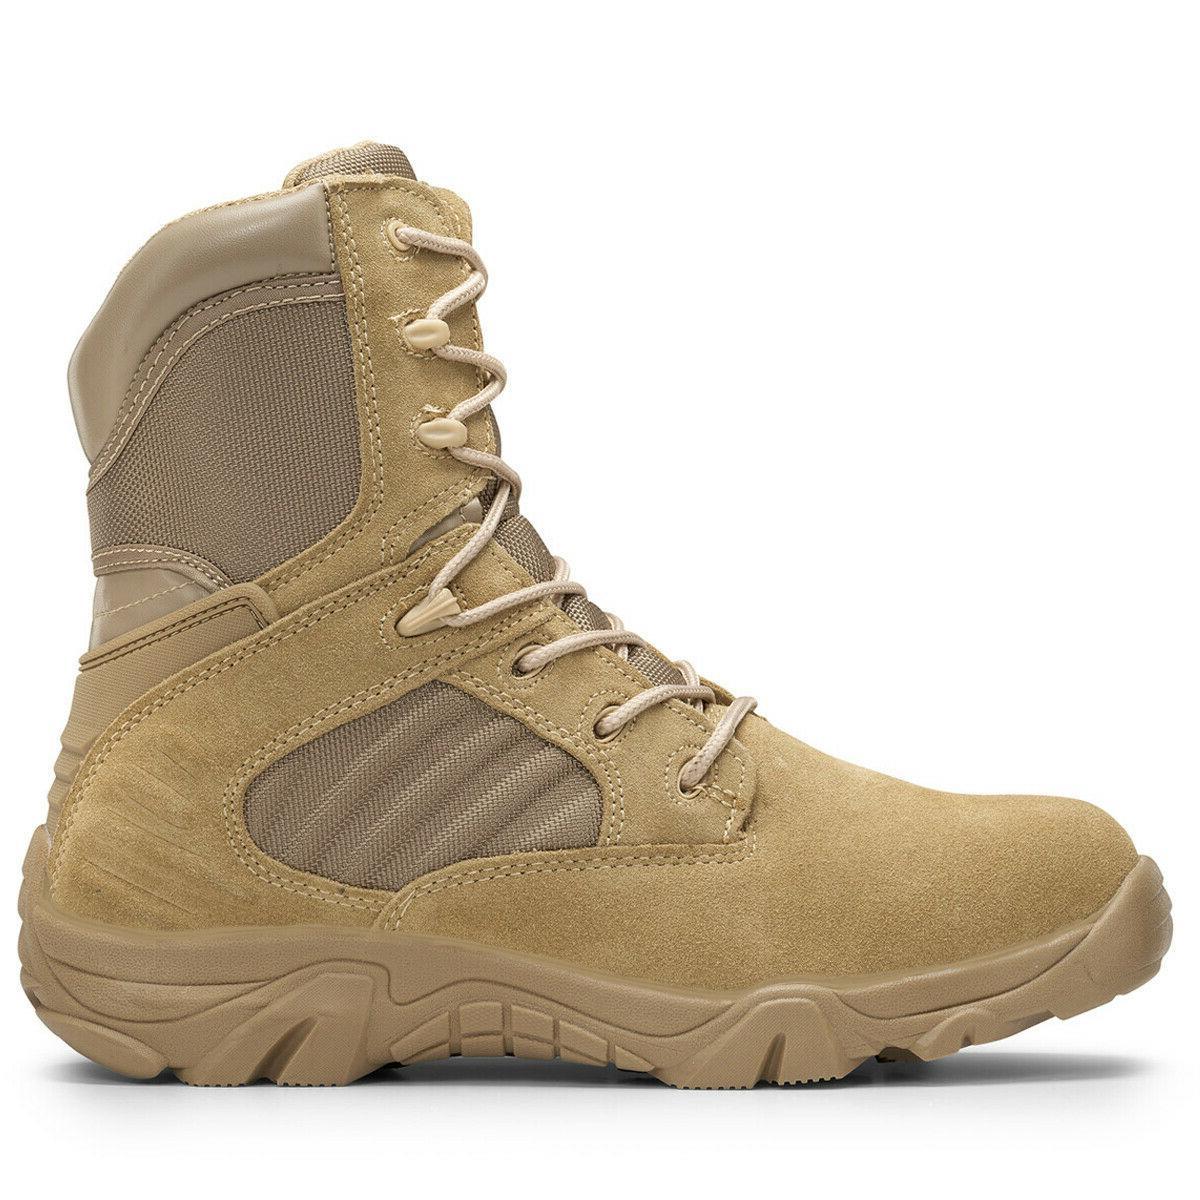 Bufferzone® Tan Military